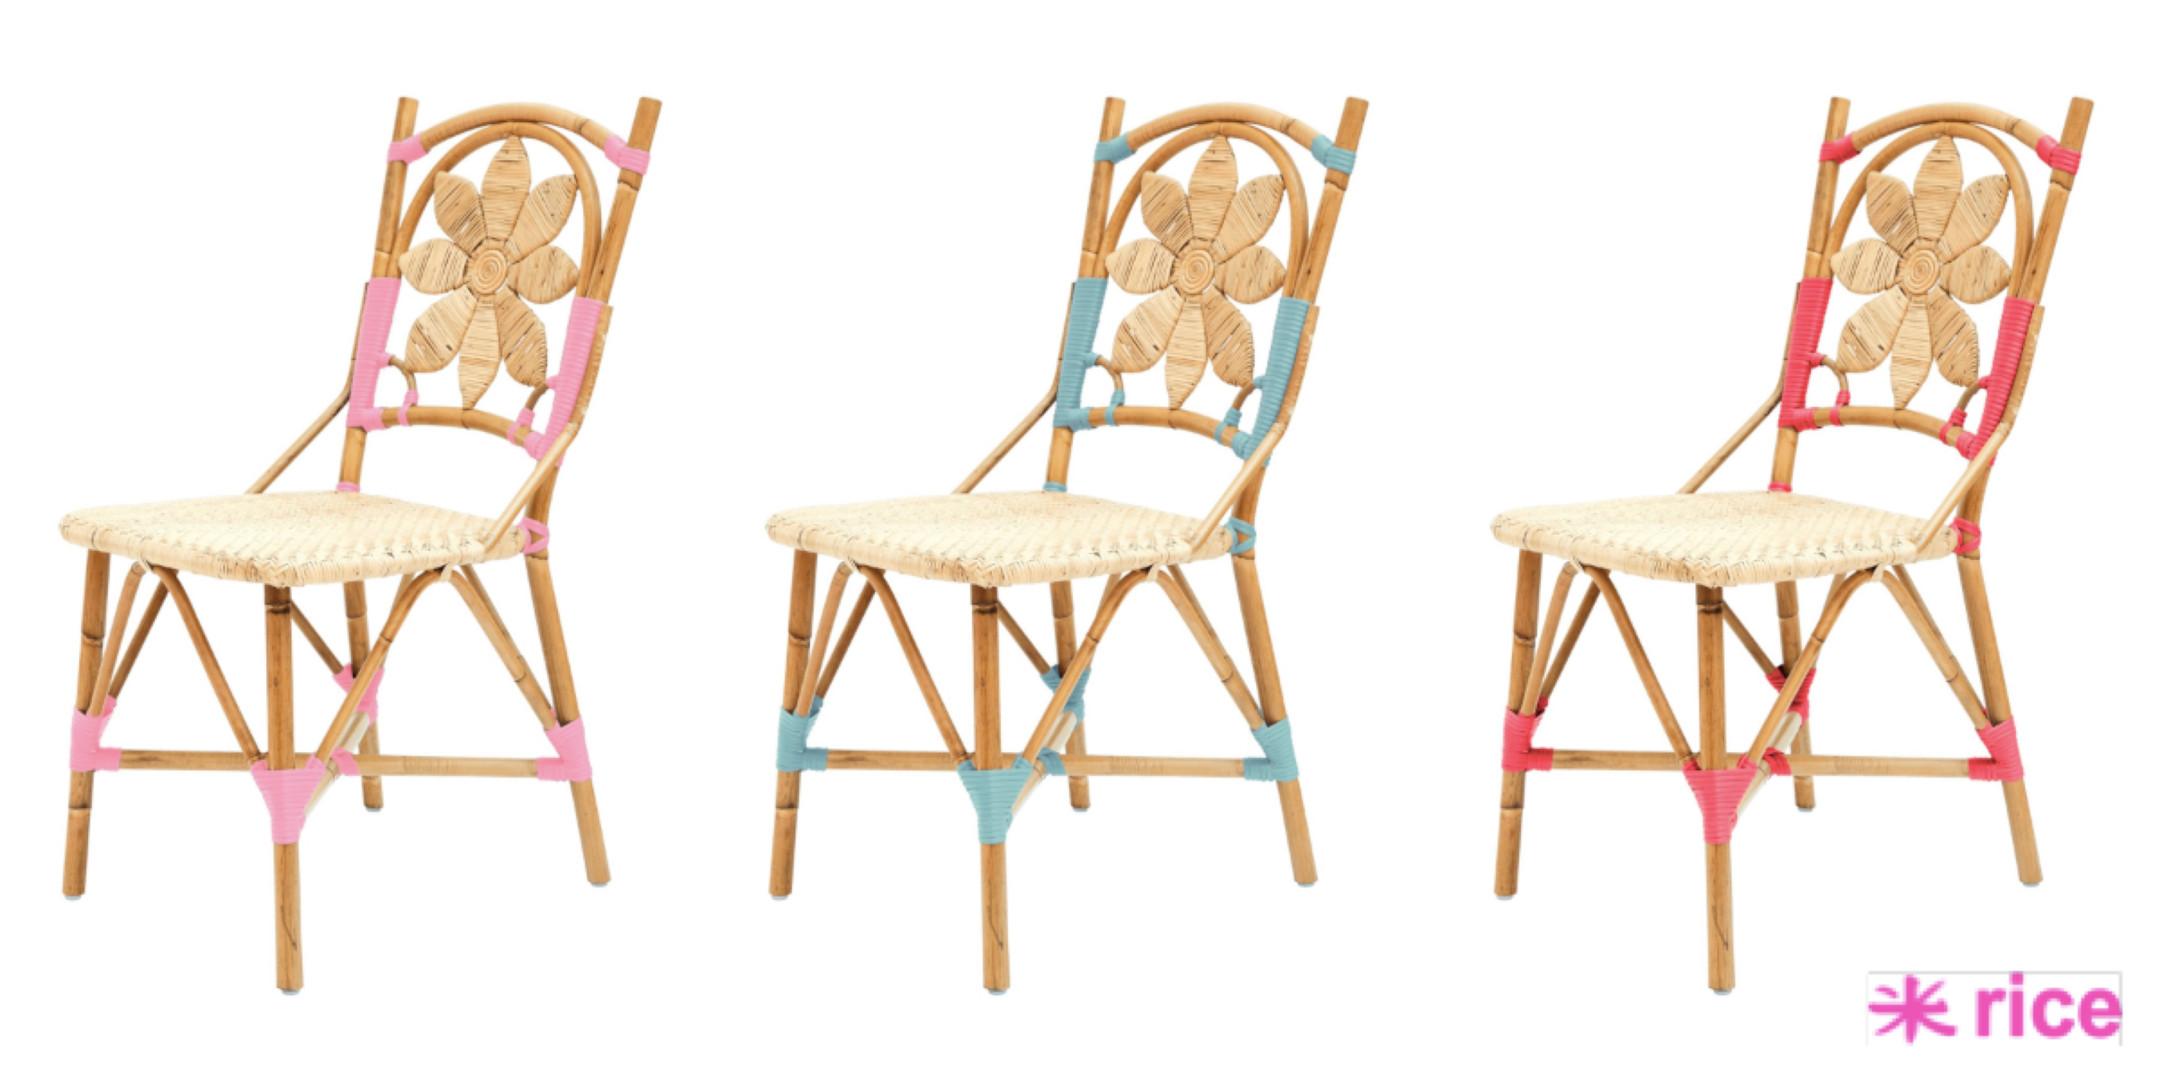 RICE stol.jpg